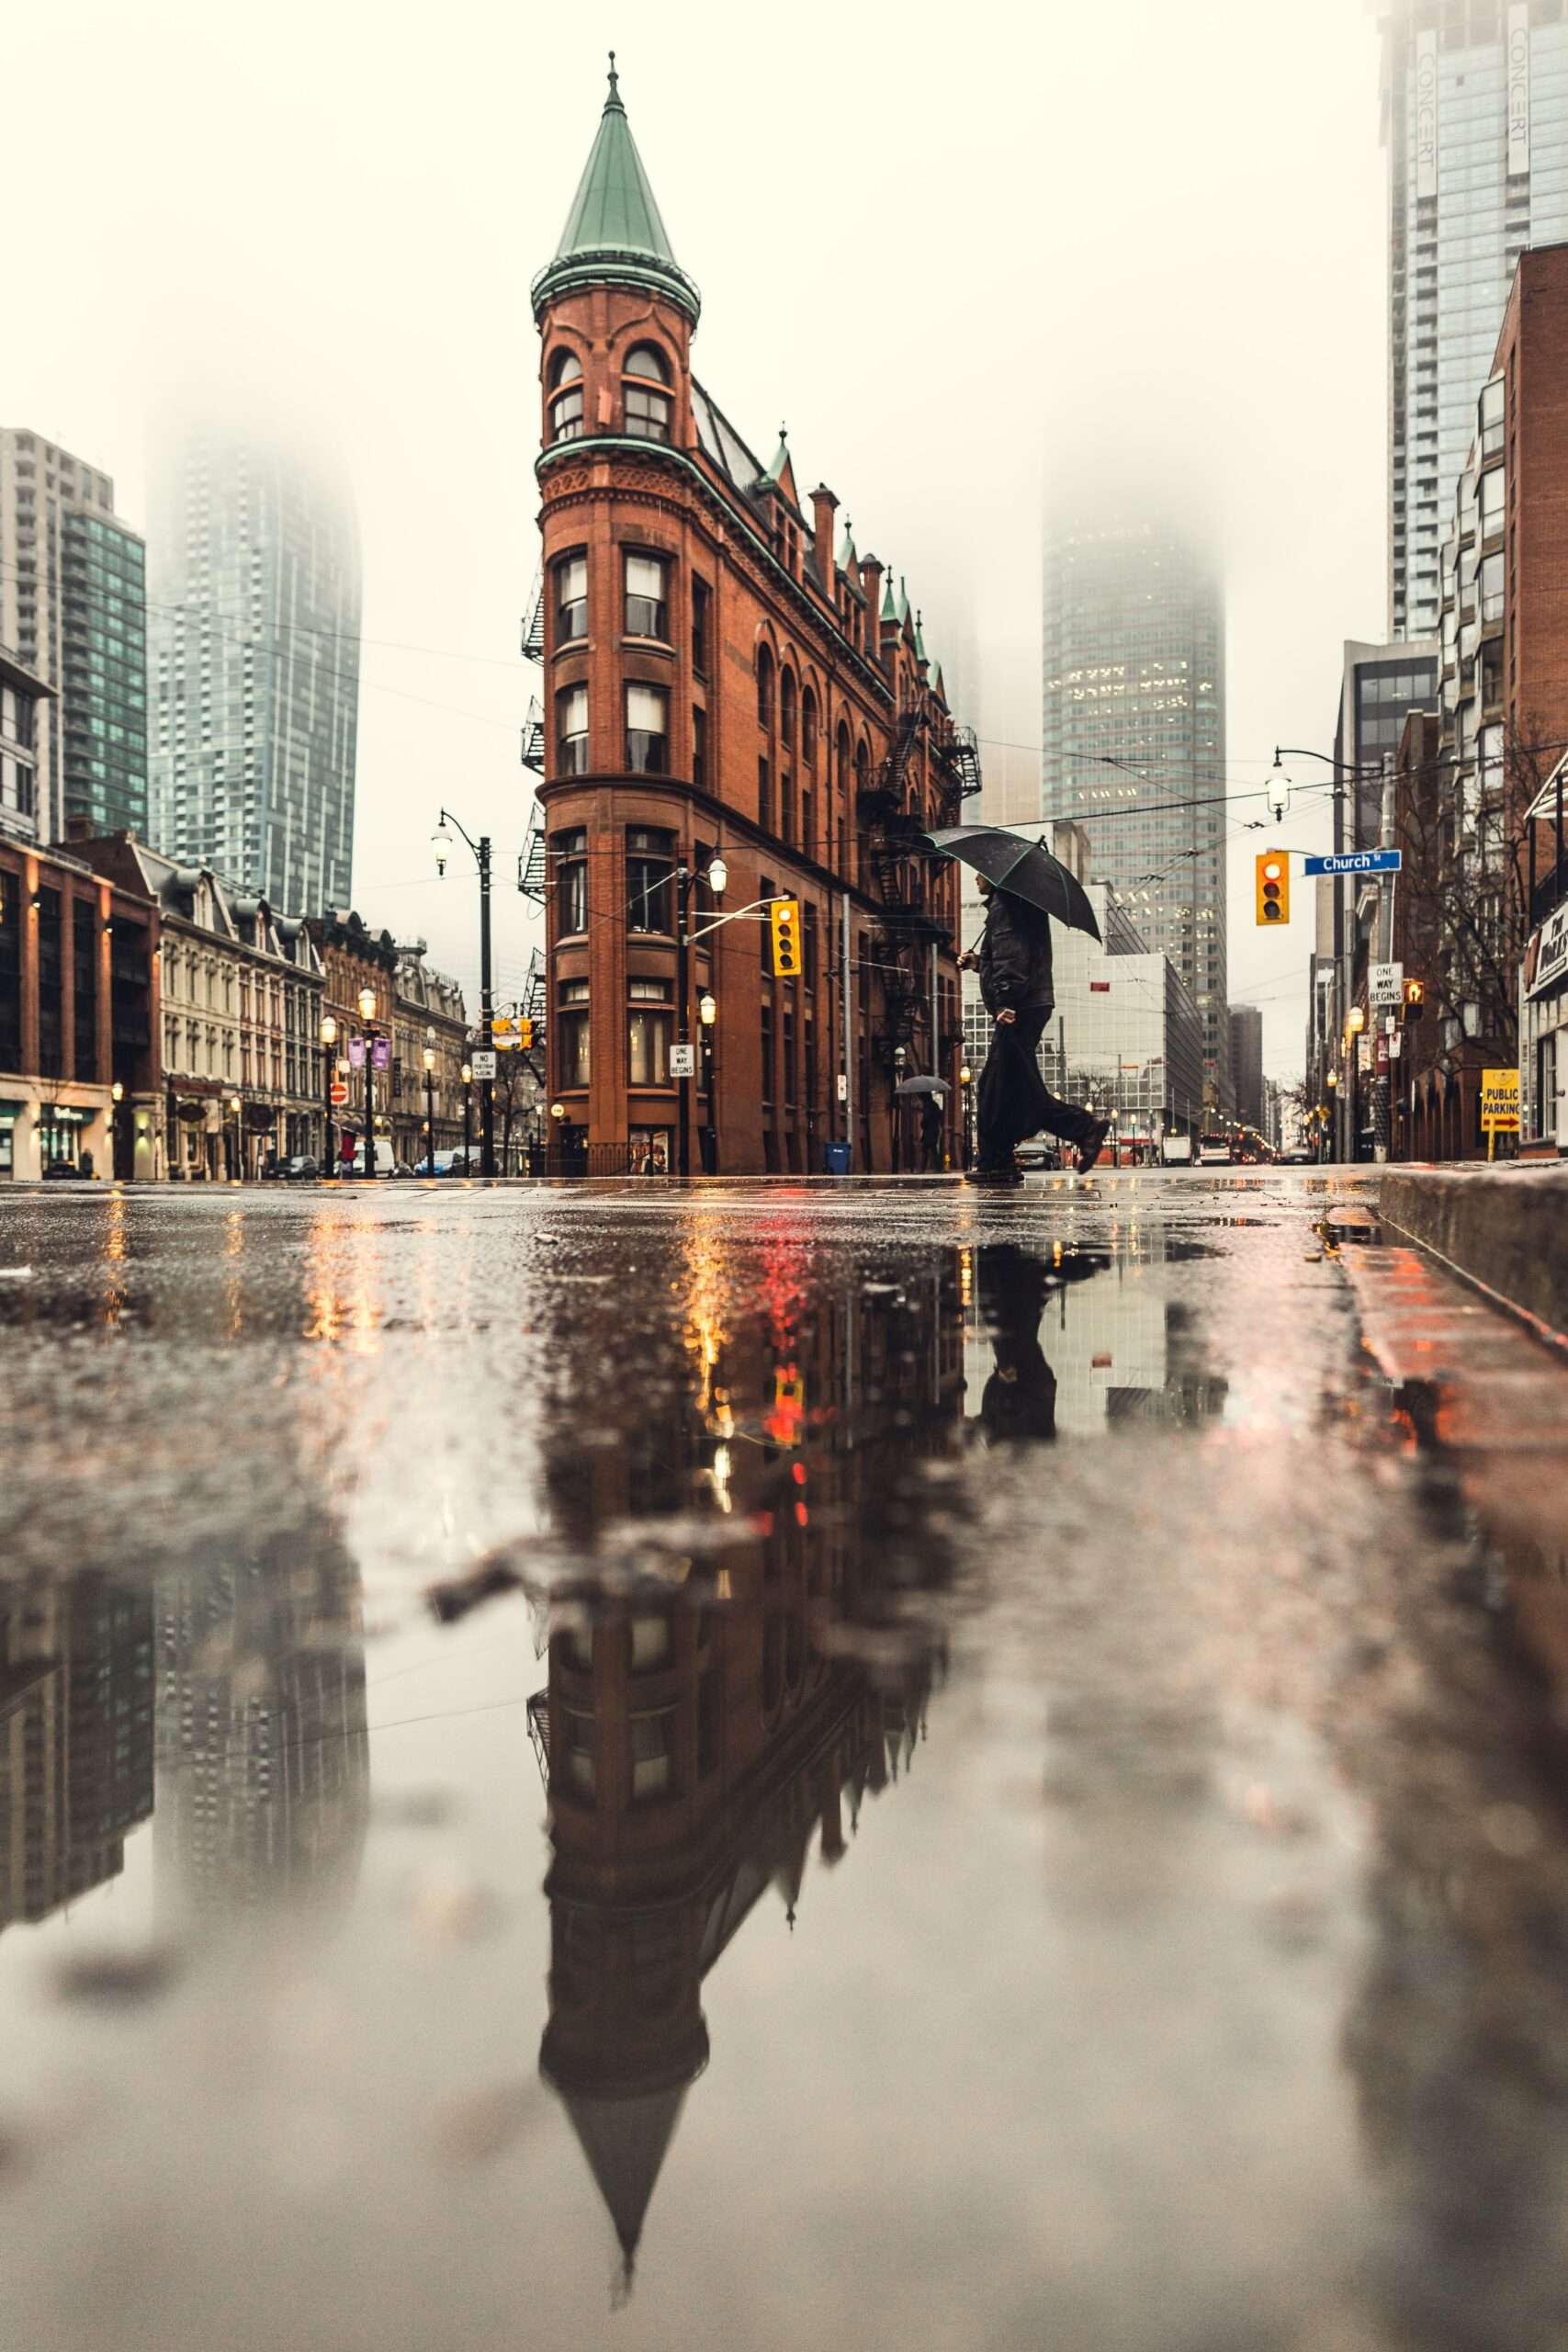 TTC modern street car in Toronto